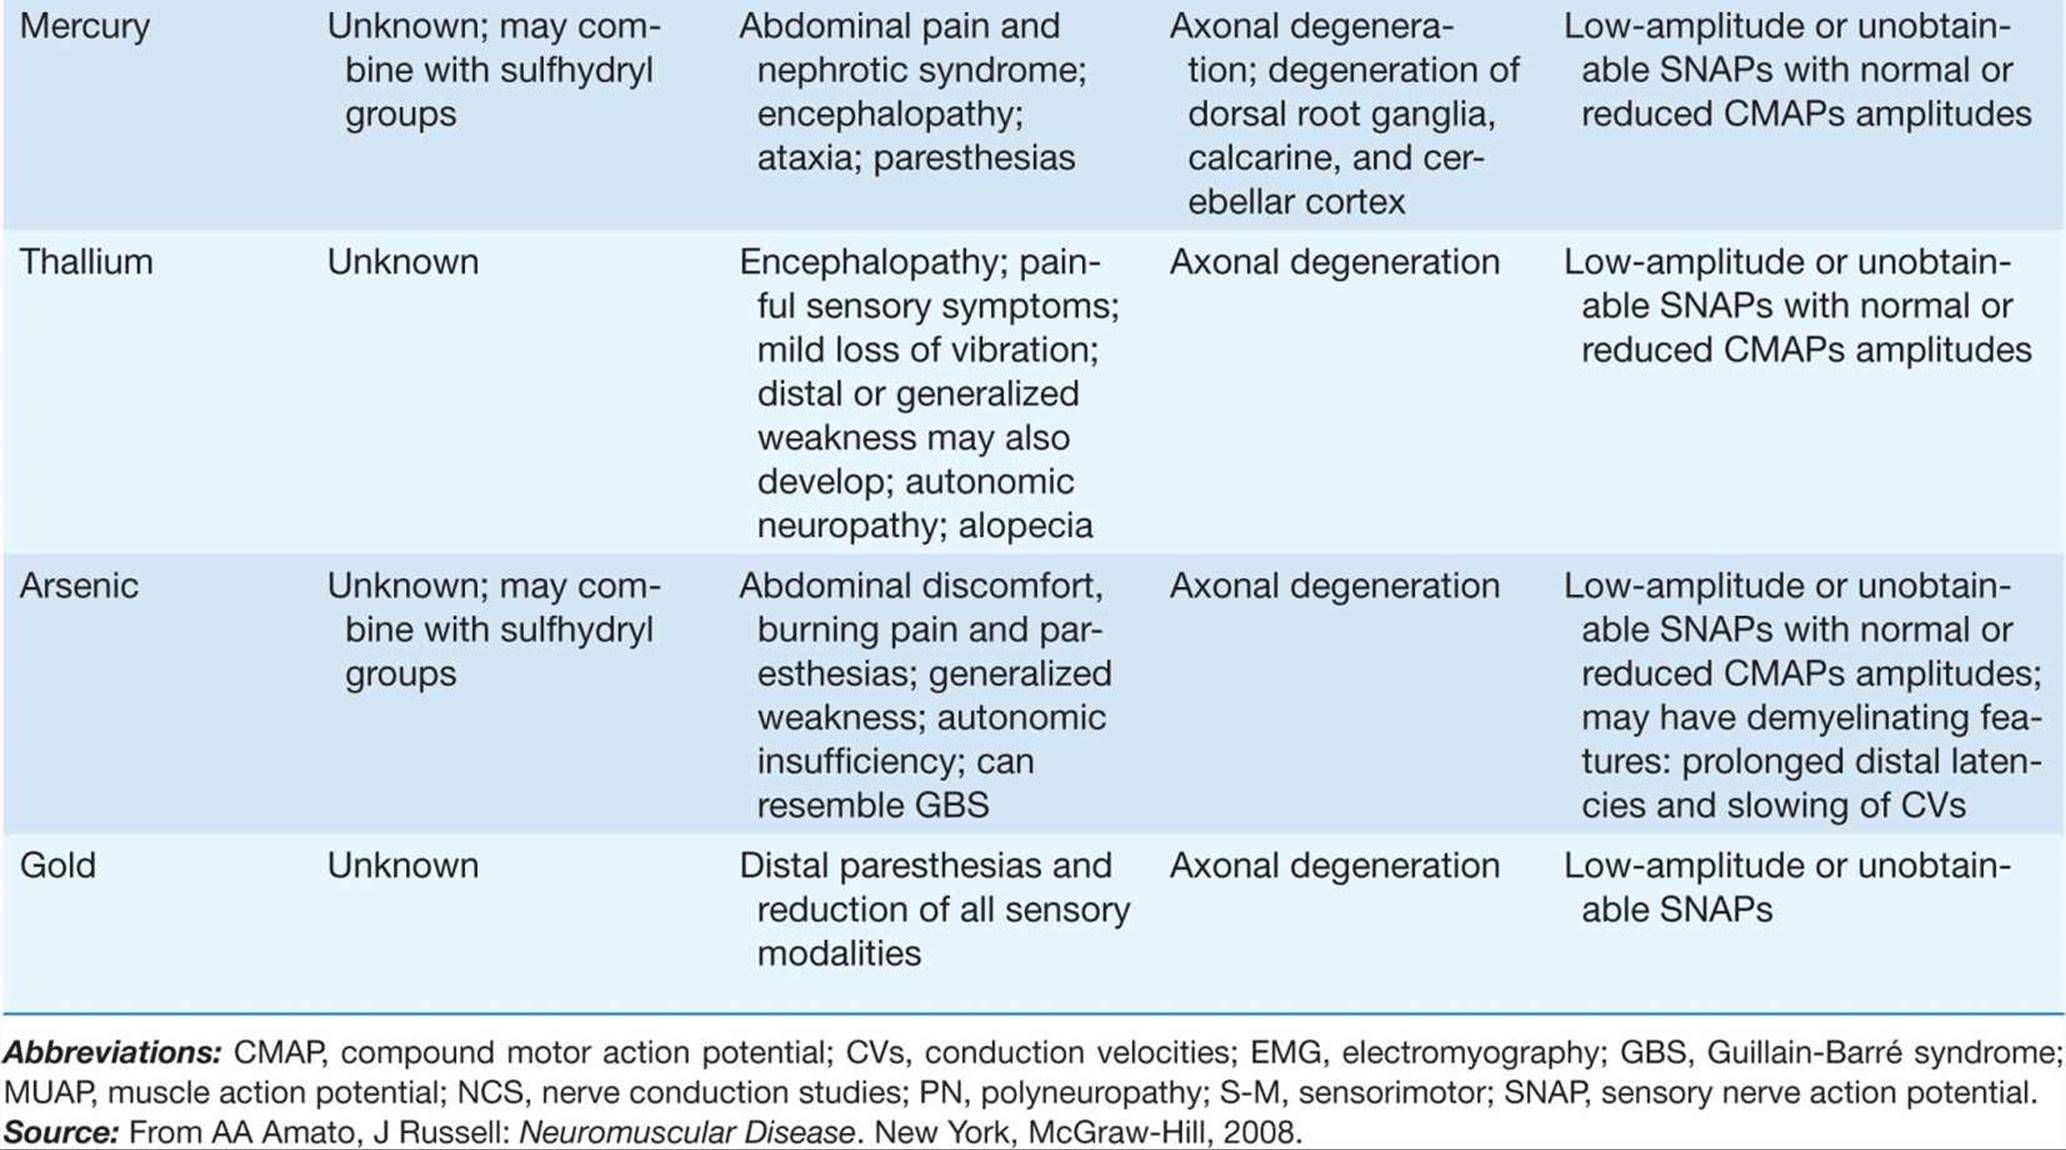 Scabies treatment ivermectin